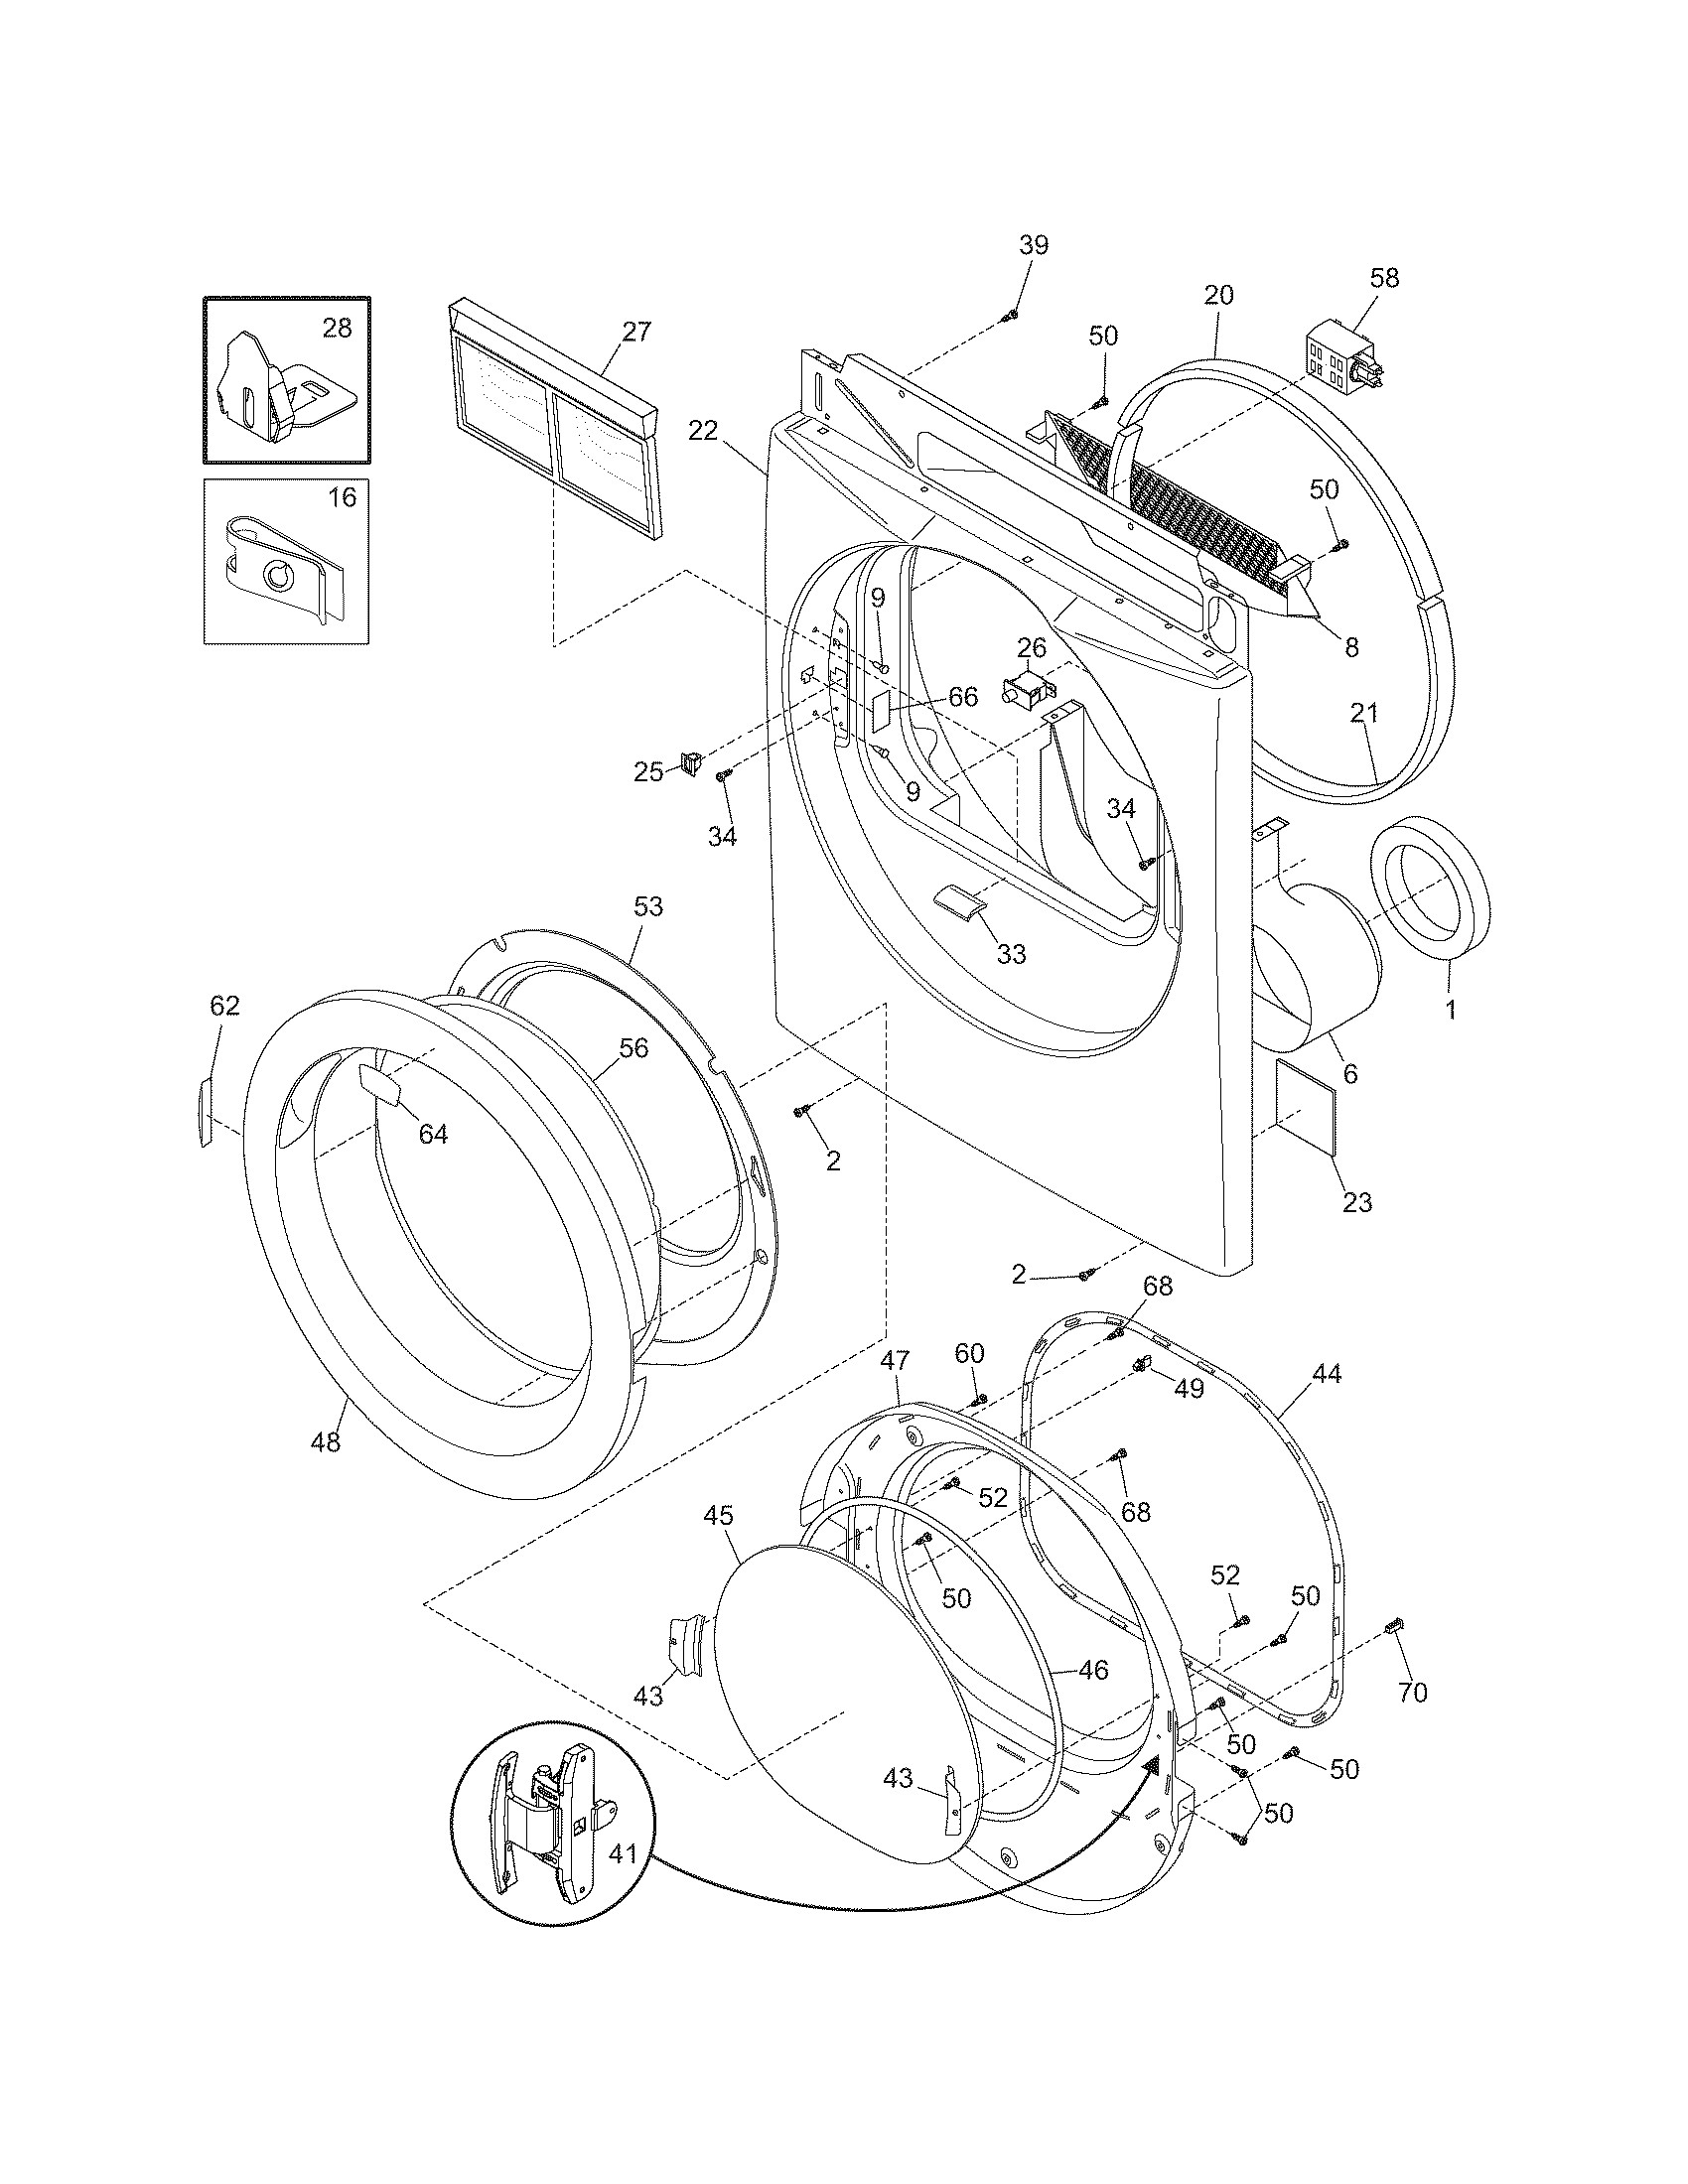 frigidaire dryer parts diagram samsung model dv52j8700ep